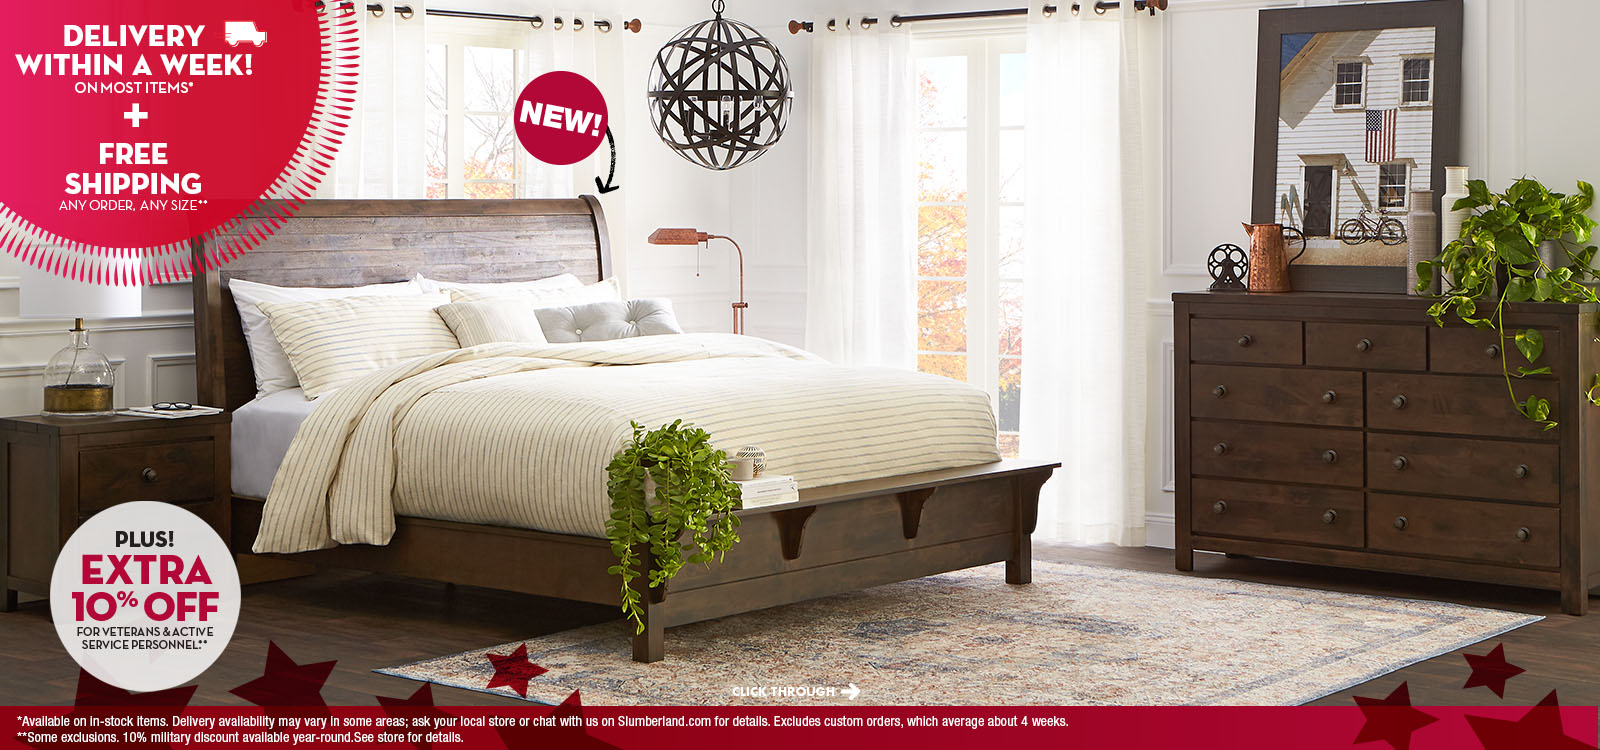 Slumberland Online Store | Slumberland Furniture